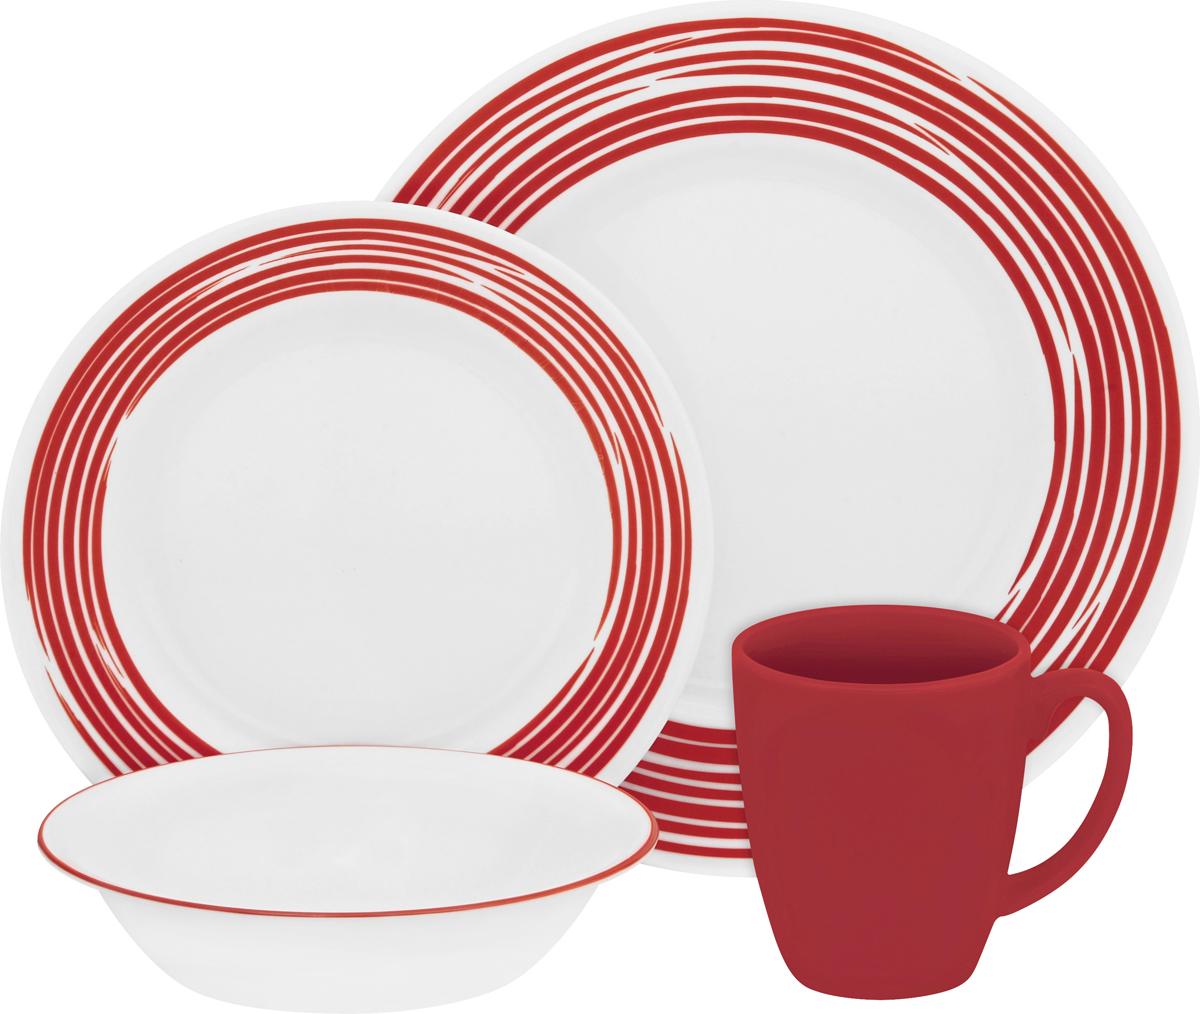 Набор посуды Corelle Brushed Red, цвет: белый, 16 предметов. 1117028 corelle набор посуды corelle city block 1088621 18 предметов nzgtzpu